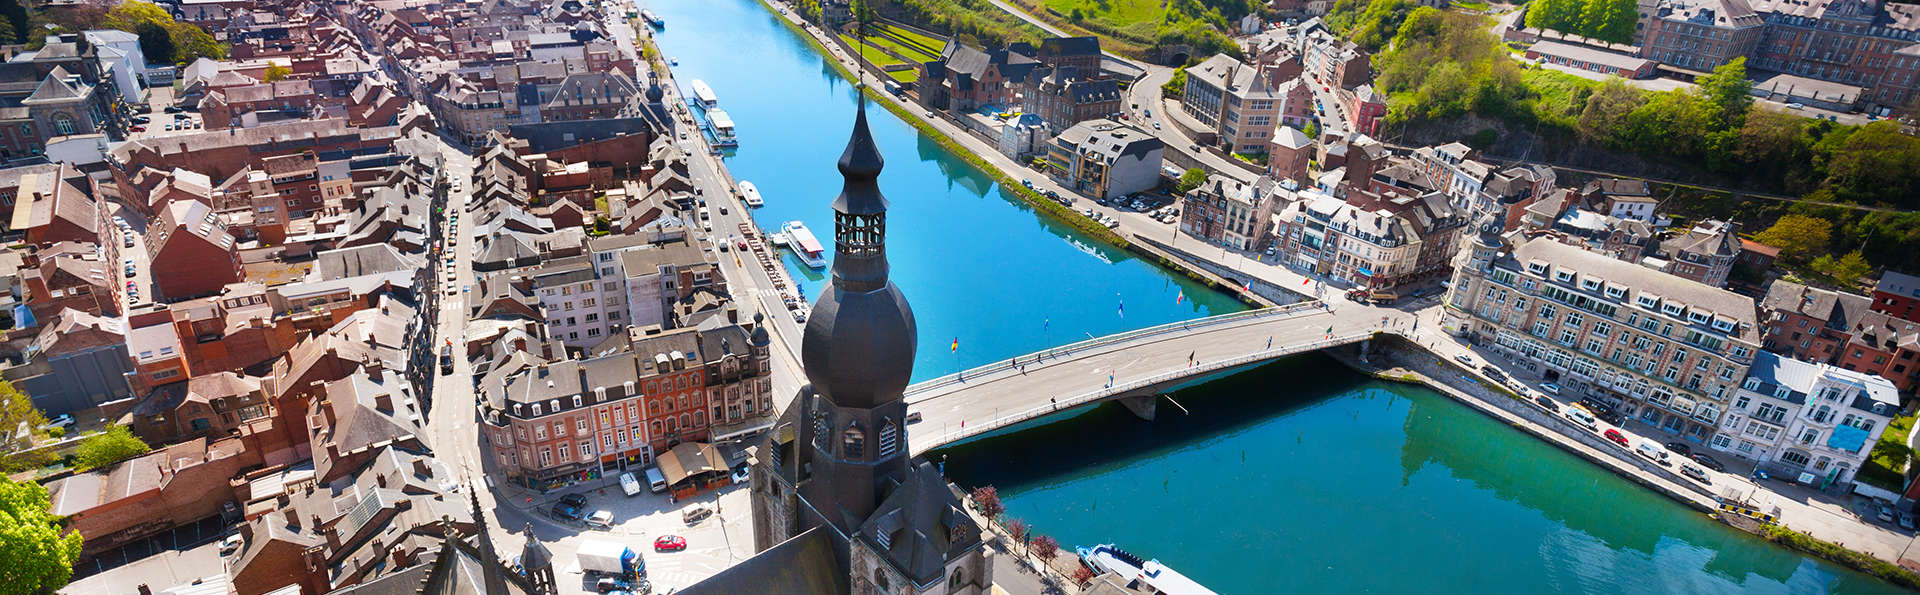 La Merveilleuse by Infiniti Resorts  Dinant Belgique